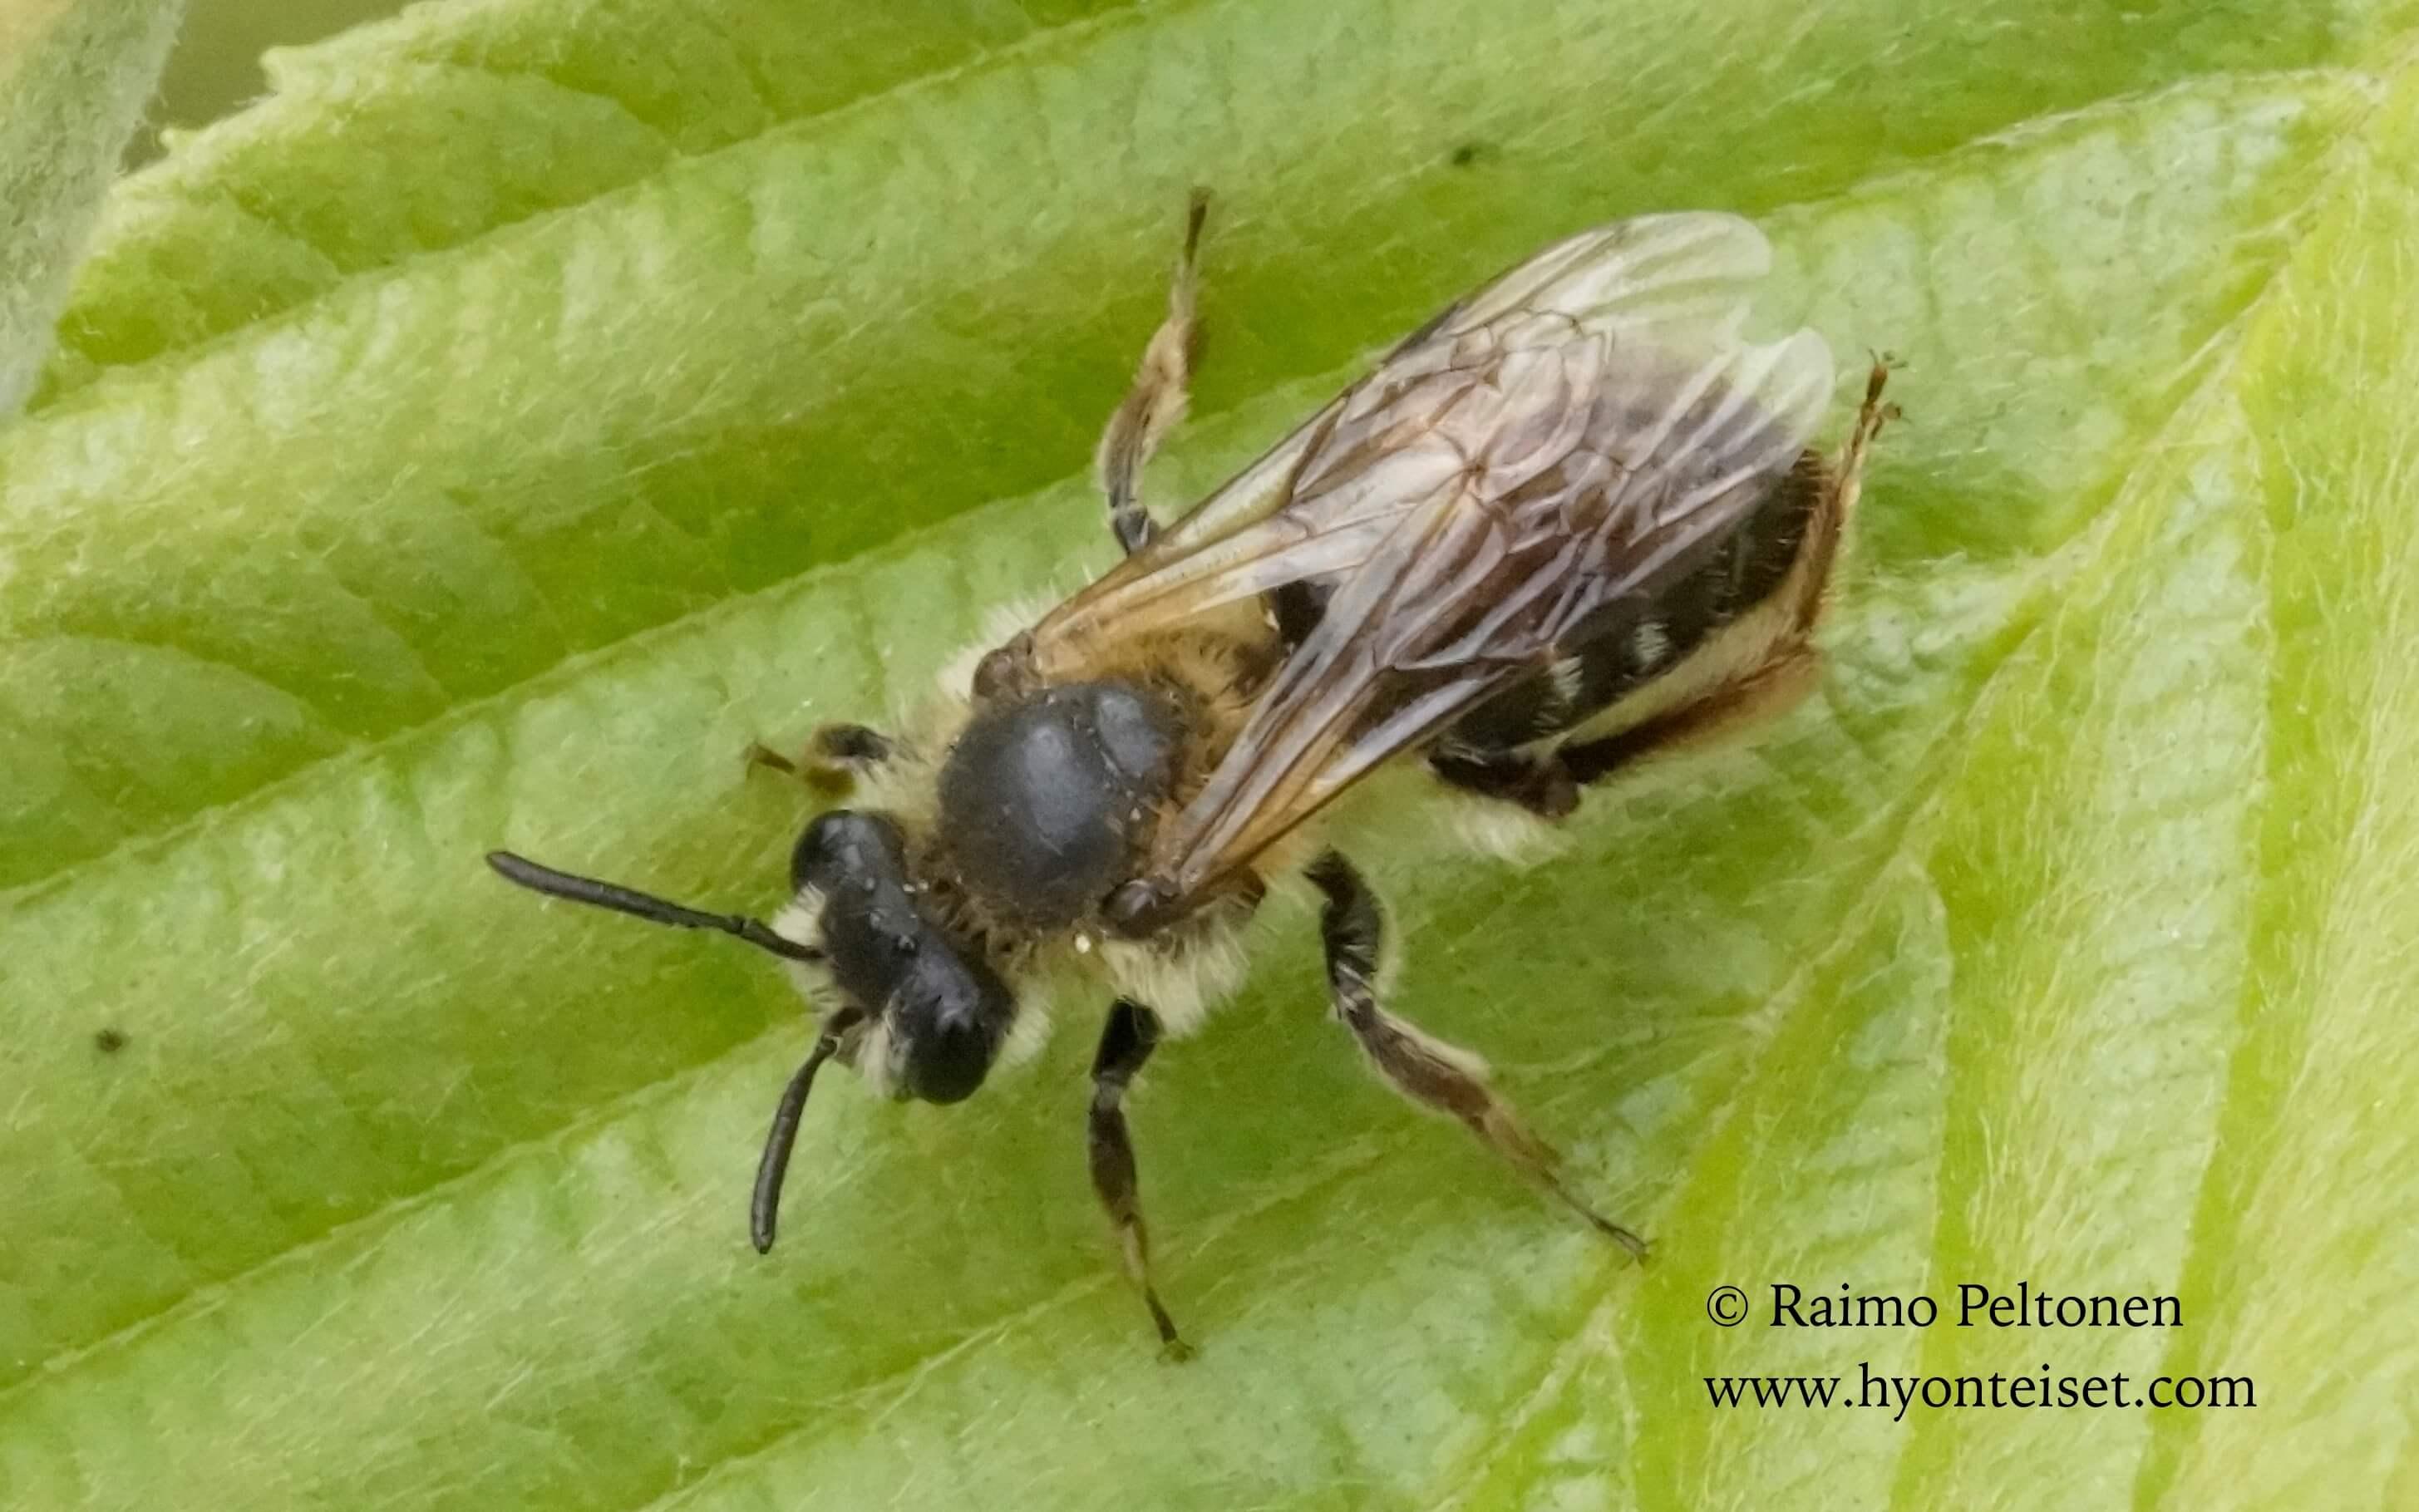 Andrena fucata/albilabris, naaras (det. Juho Paukkunen), 15.7.2016 Jyväskylä